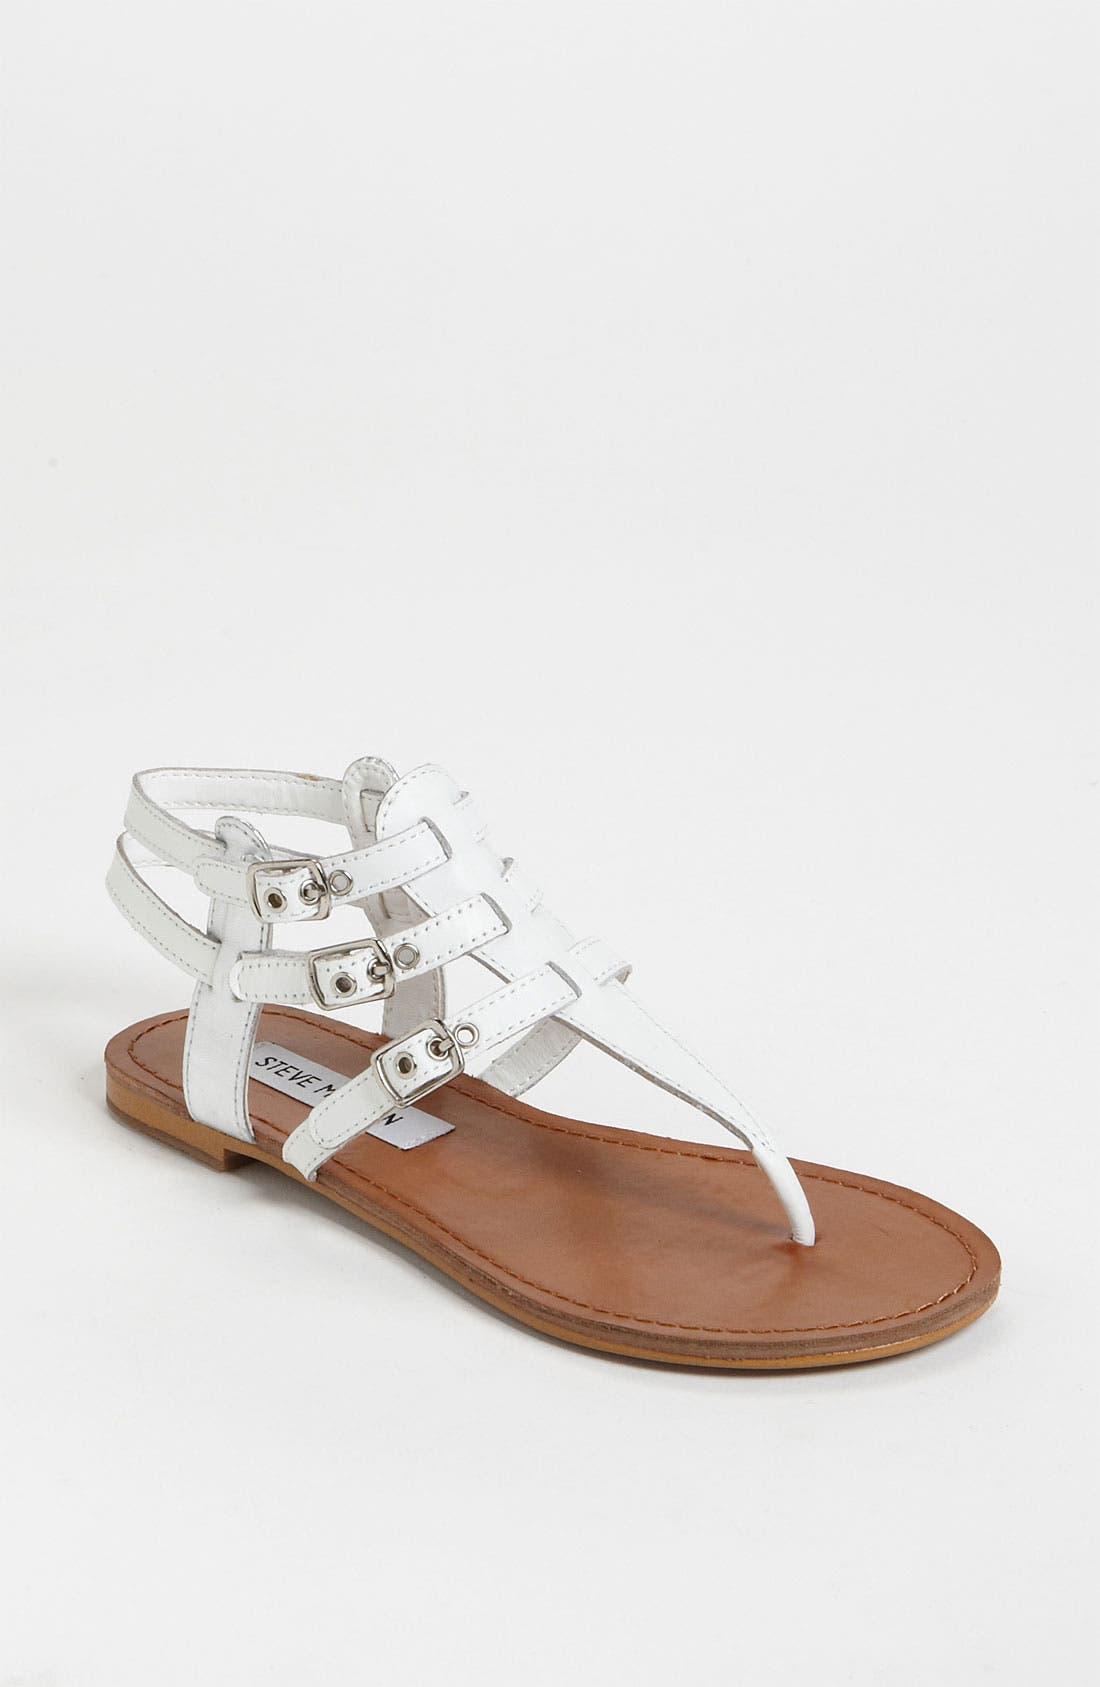 Alternate Image 1 Selected - Steve Madden 'Saahti' Sandal